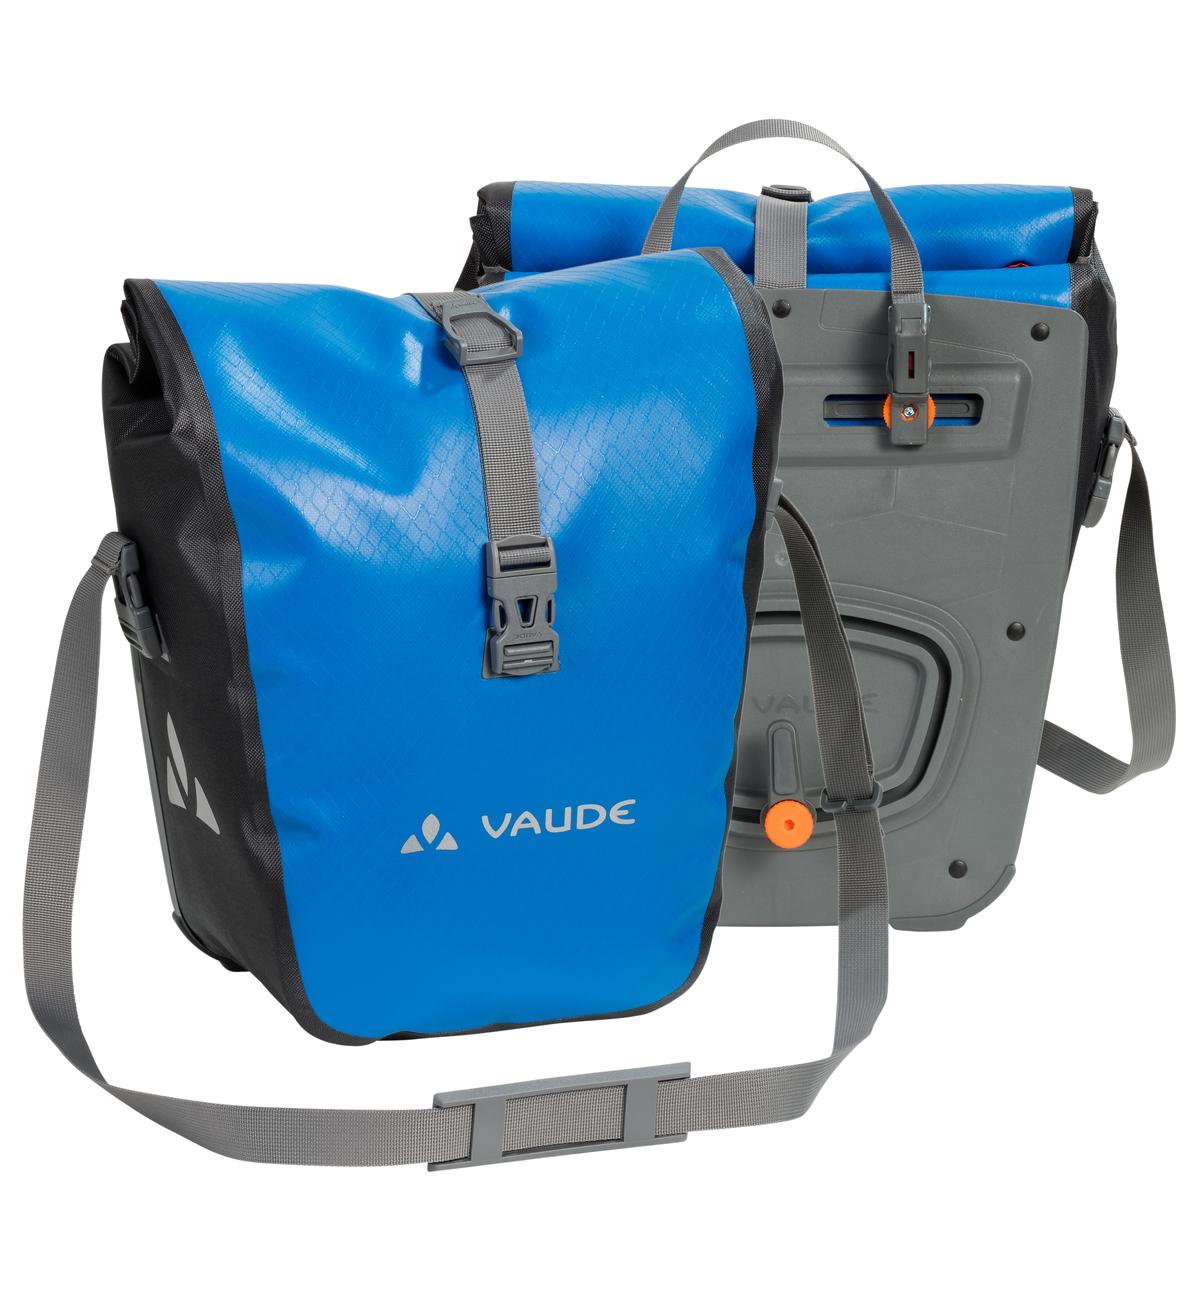 VAUDE Aqua Front blue  - 2-Rad-Sport Wehrle